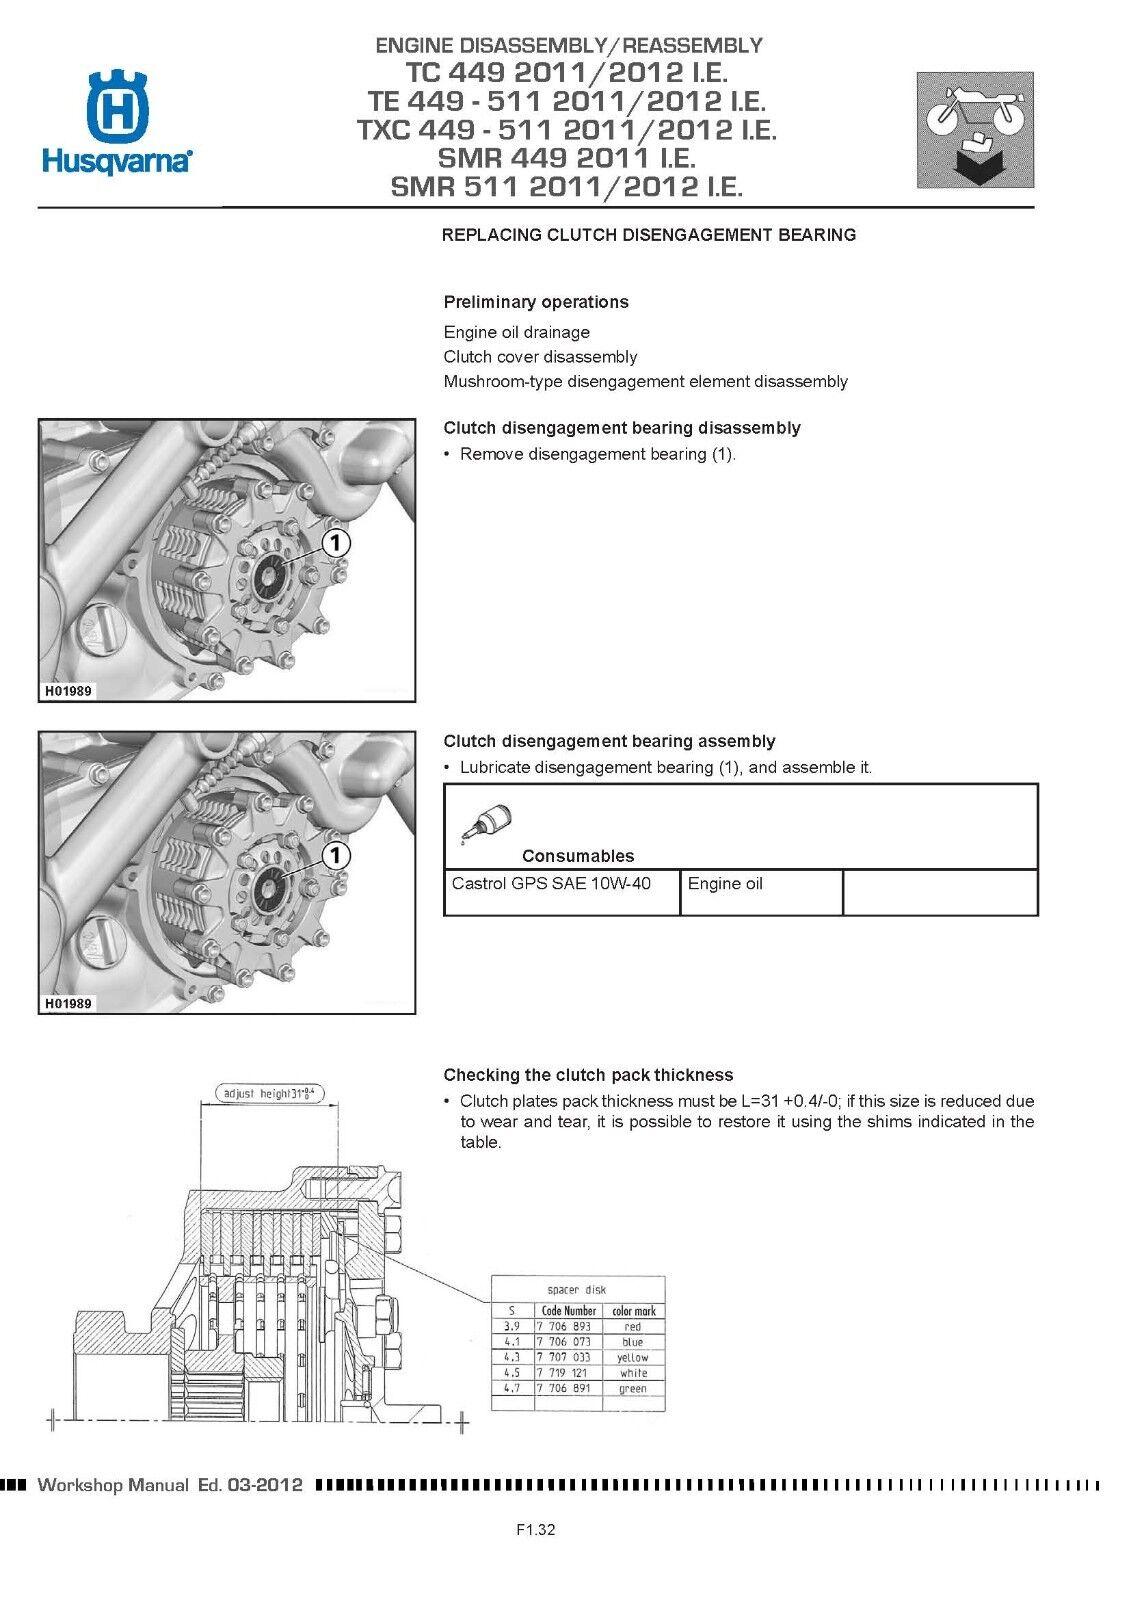 Husqvarna Service Workshop Manual Txc 449 511 2011 2012 I E Ebay Engine Diagram